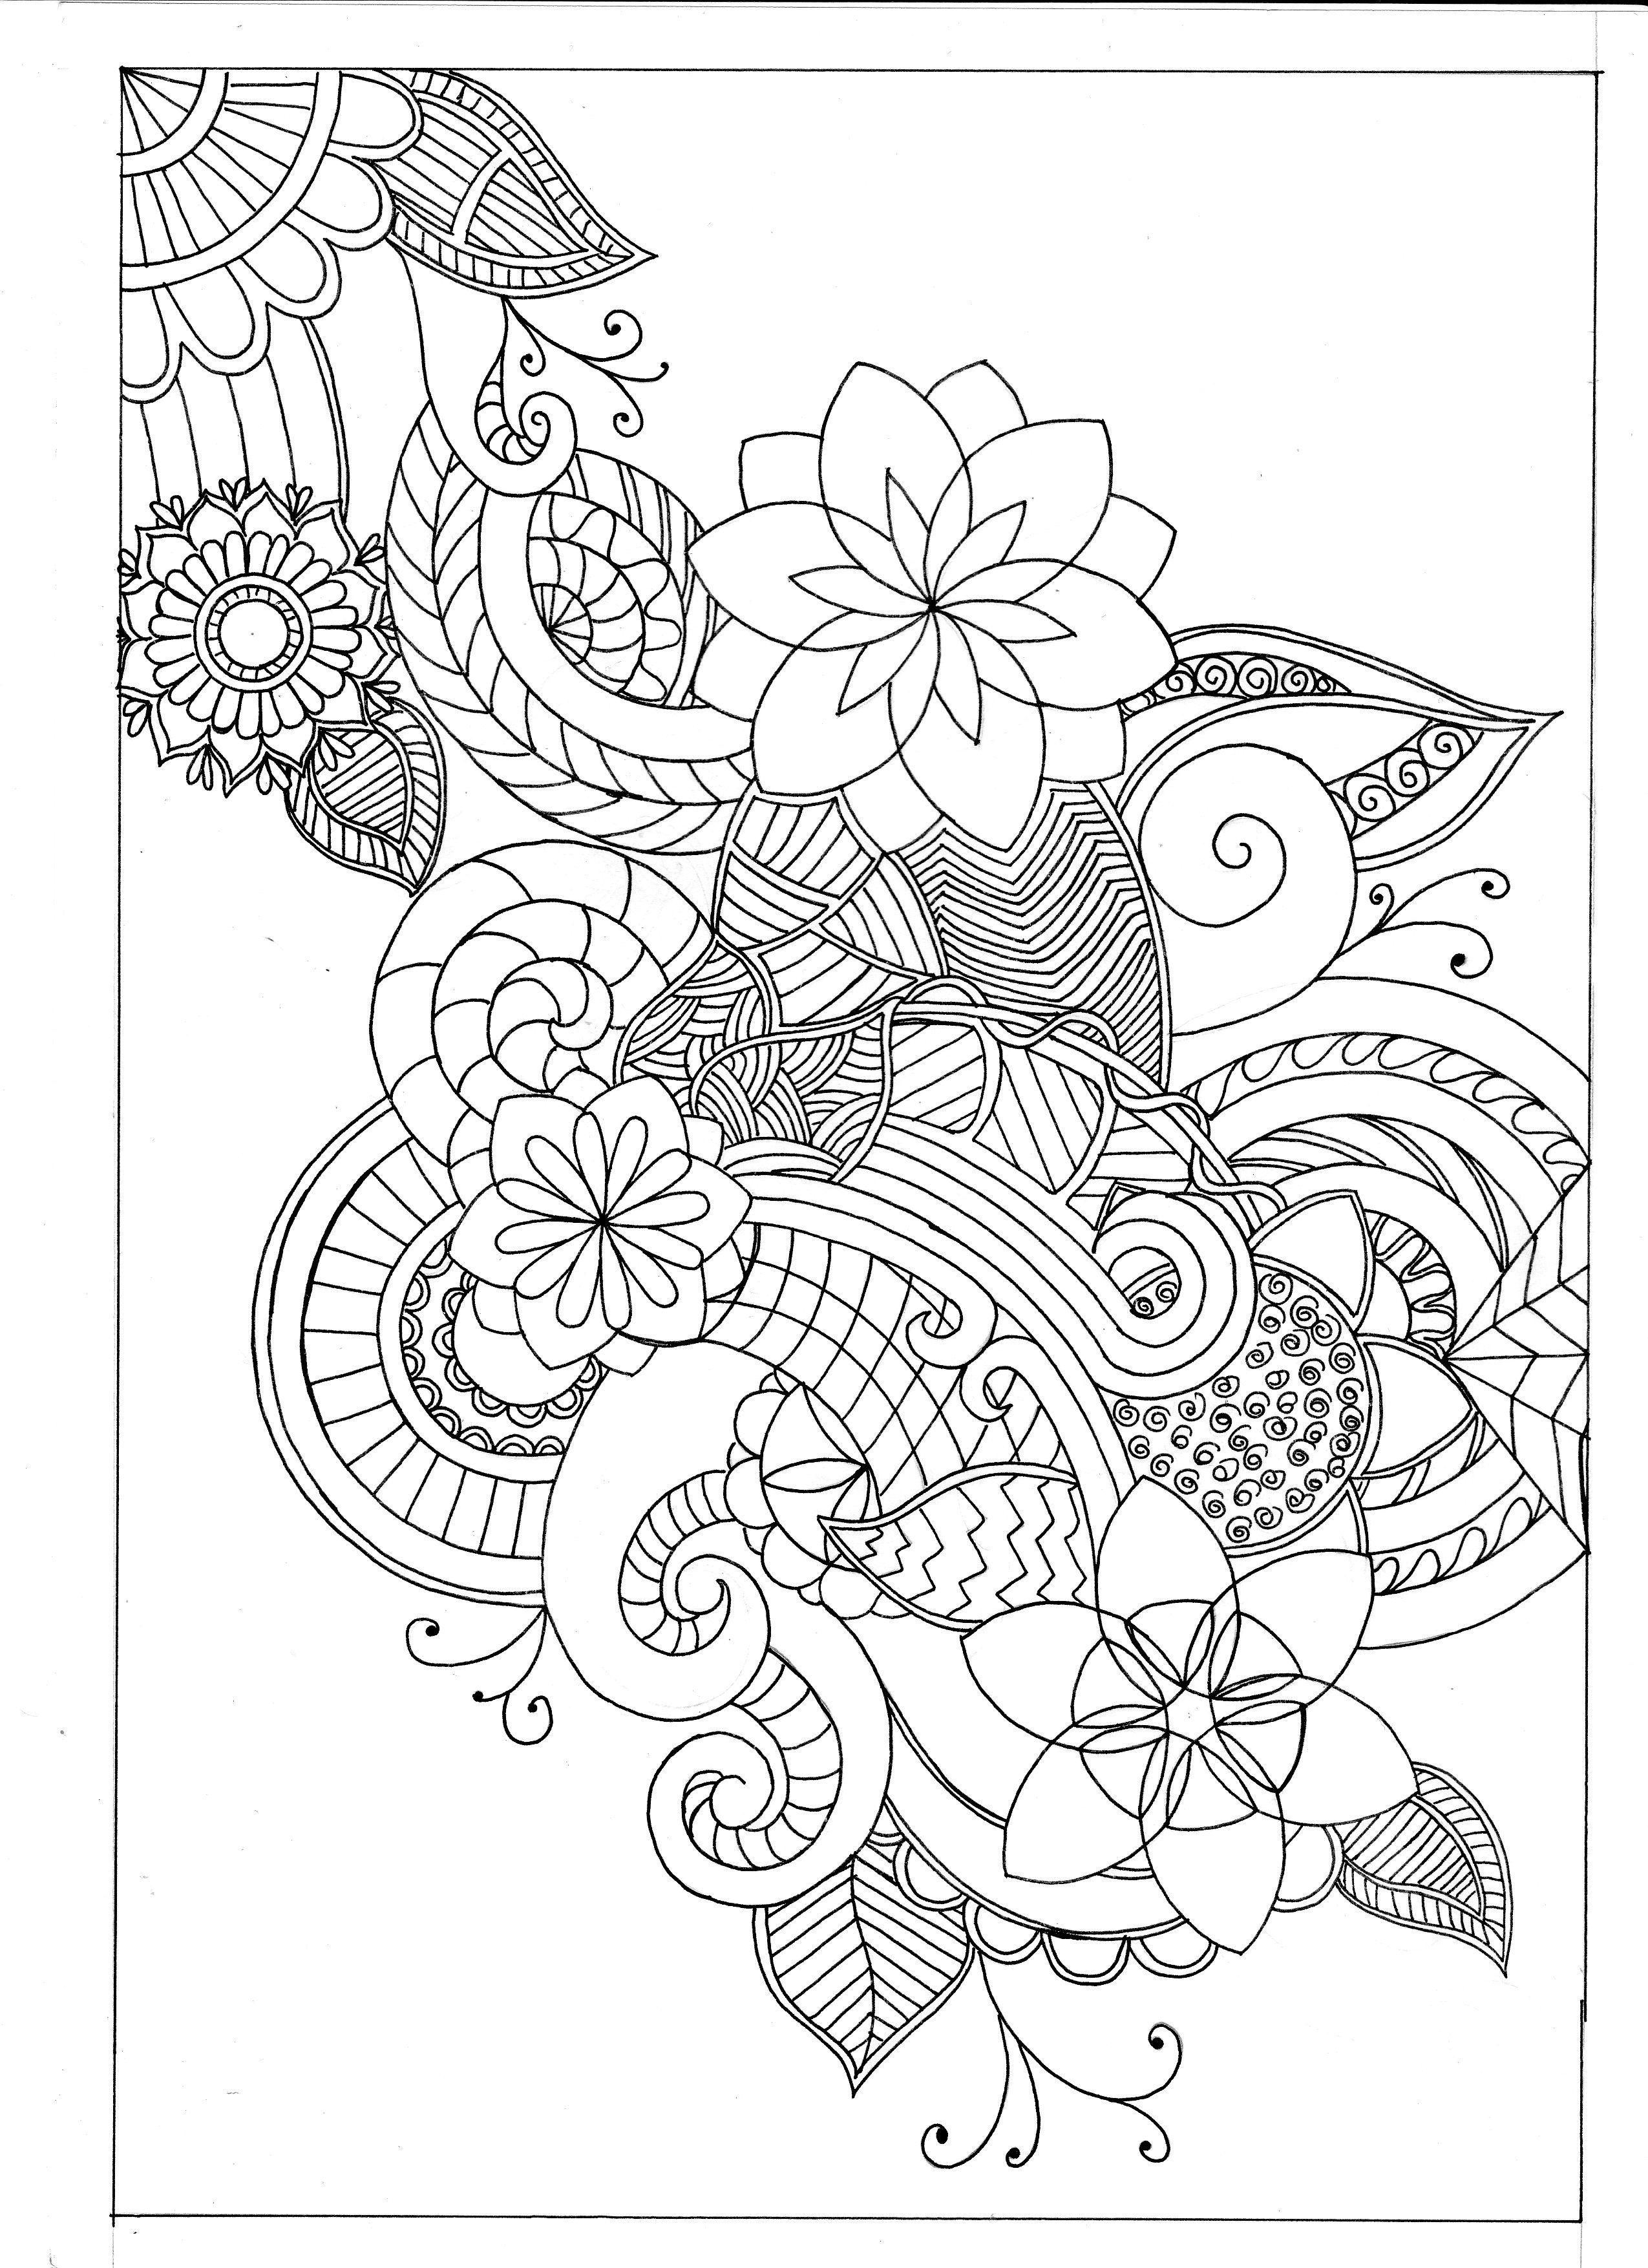 fine line coloring pages - photo#1